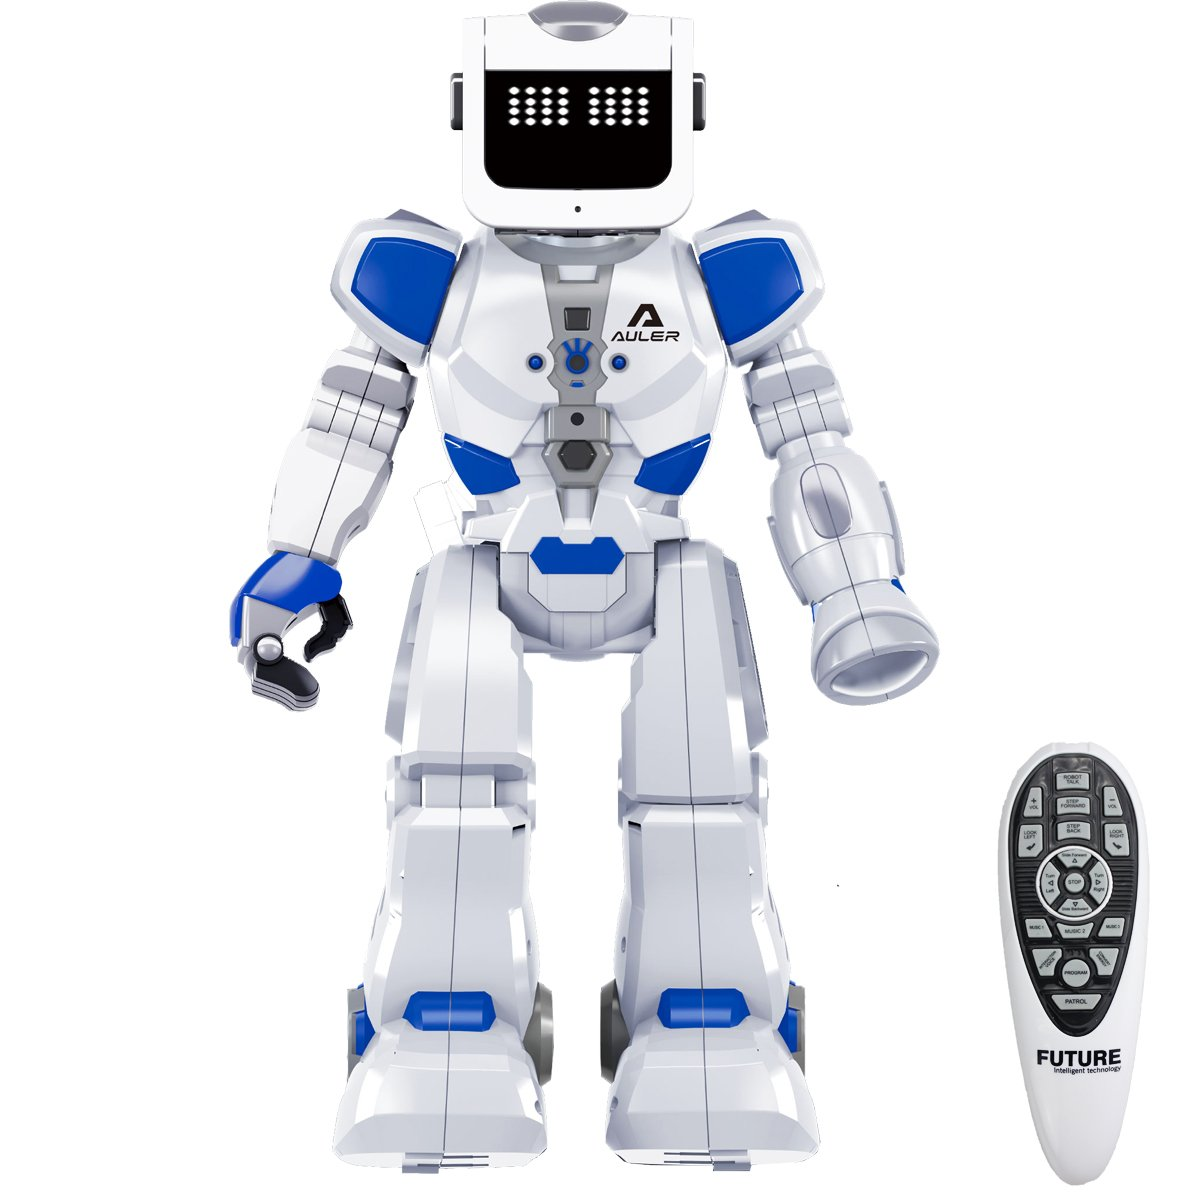 Fistone Rc Robot Smart Robotics Learning Education Toy 2 4g